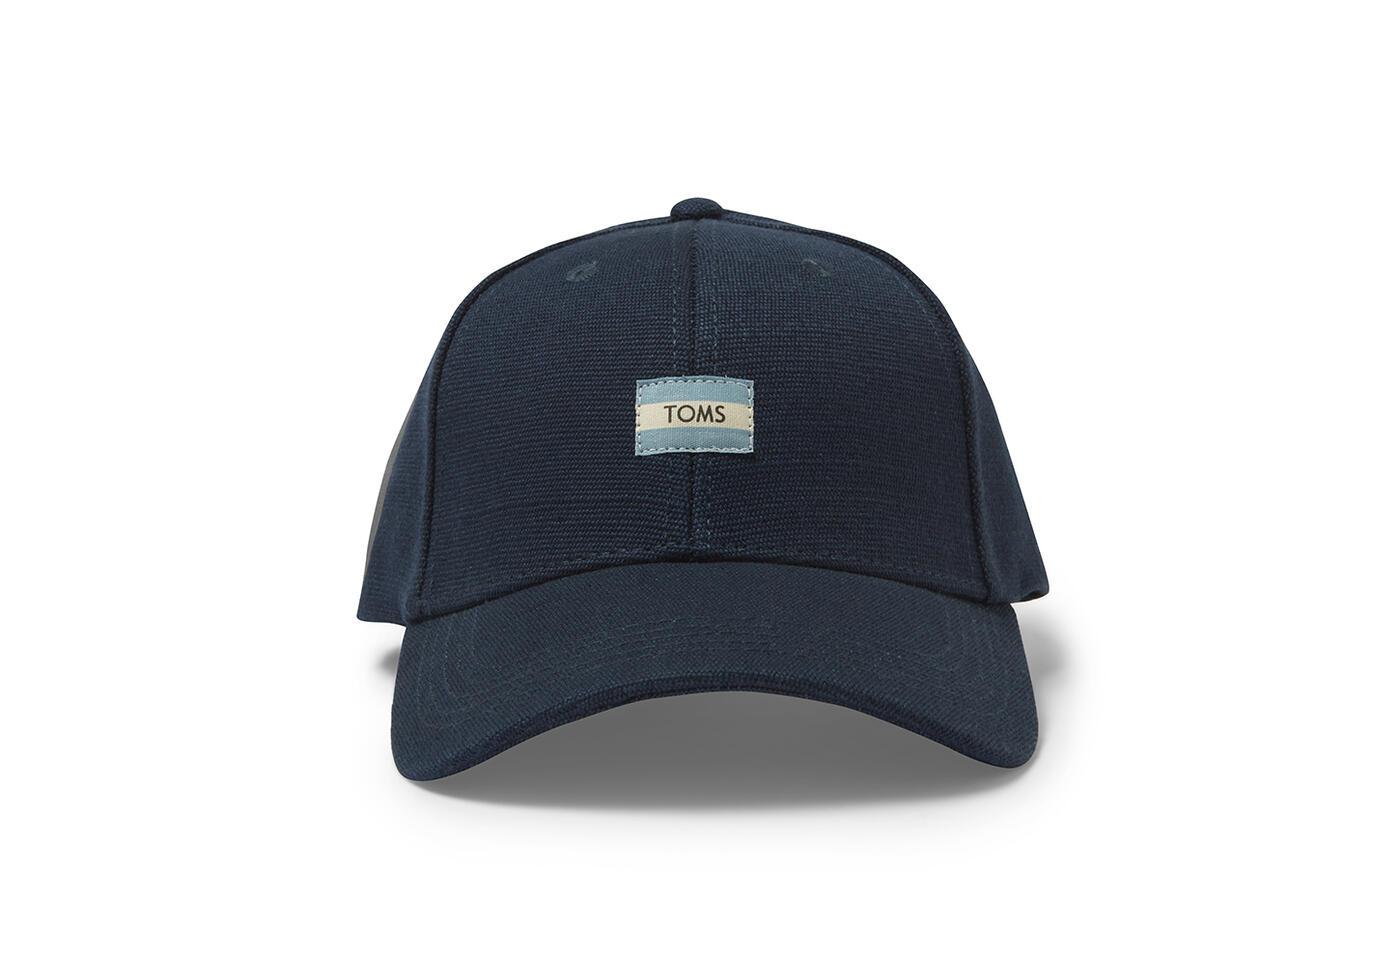 TOMS Logo Cap $24.95